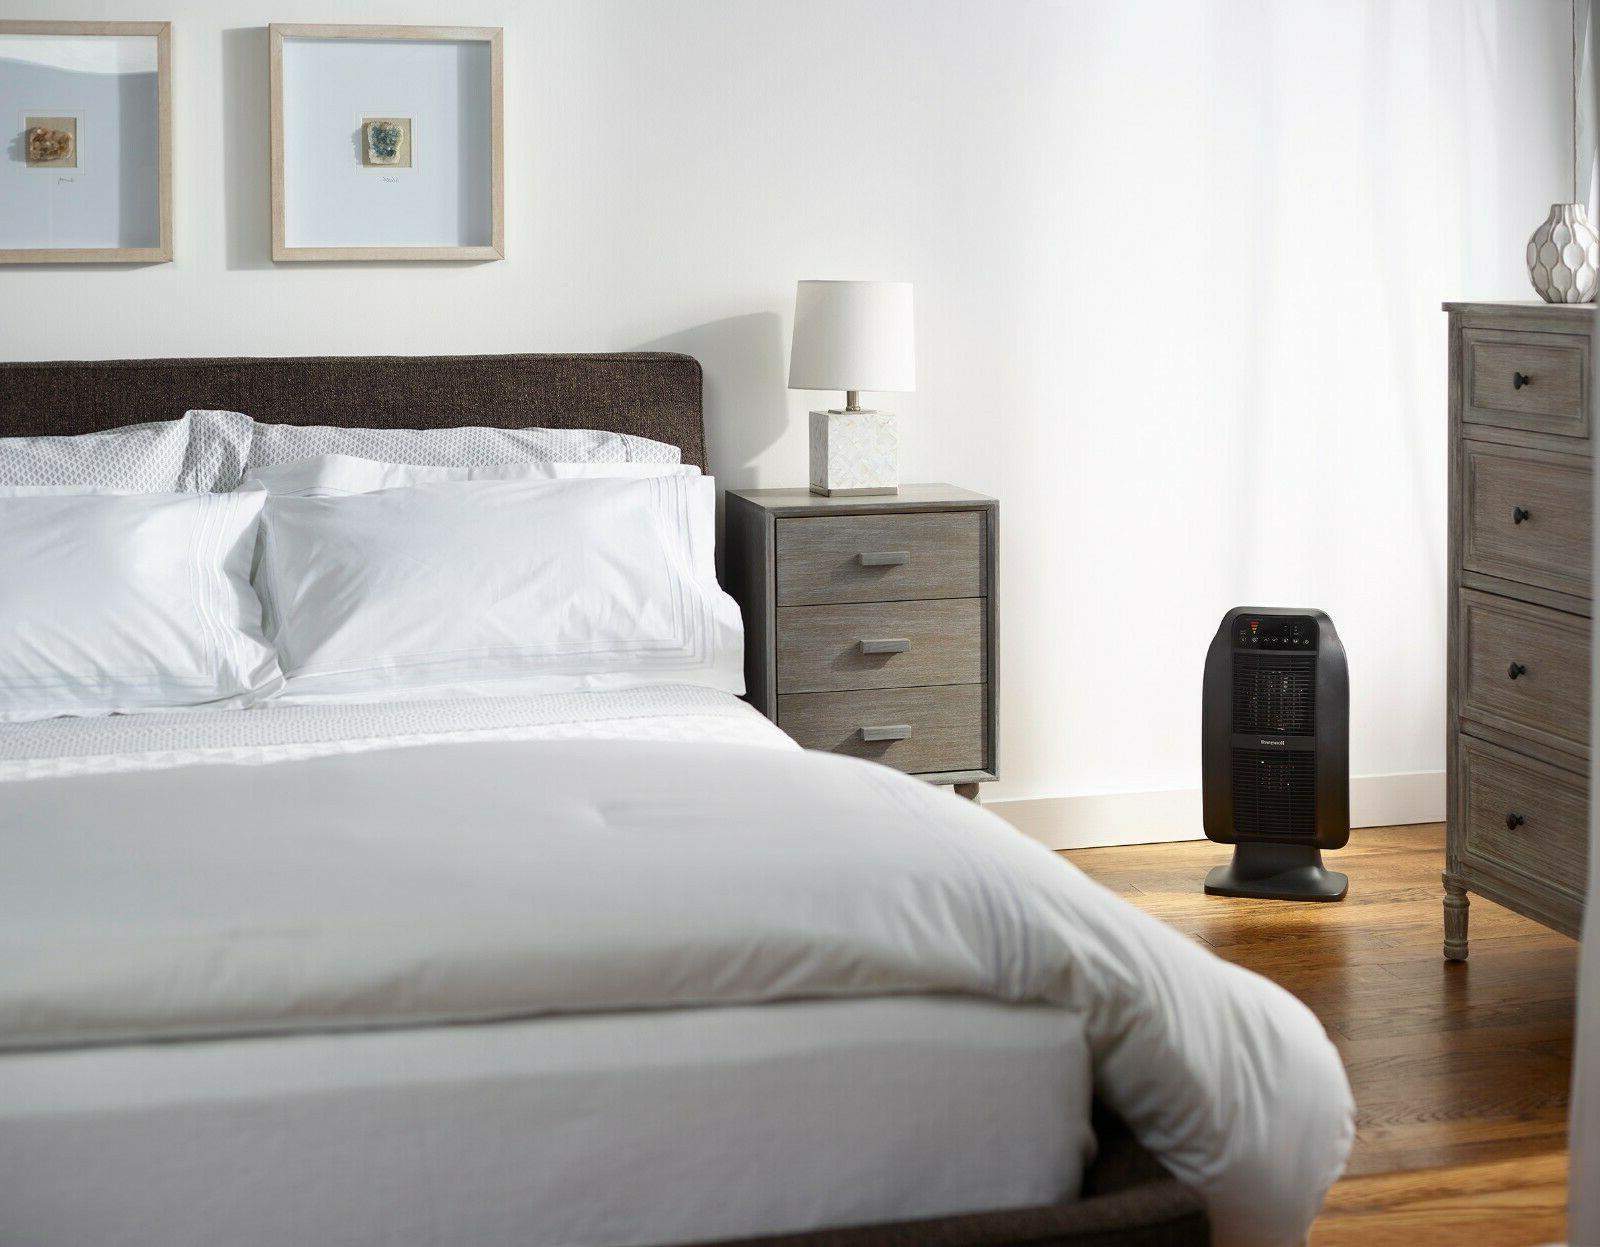 Honeywell Settings Mode Space Heater 845 Ceramic